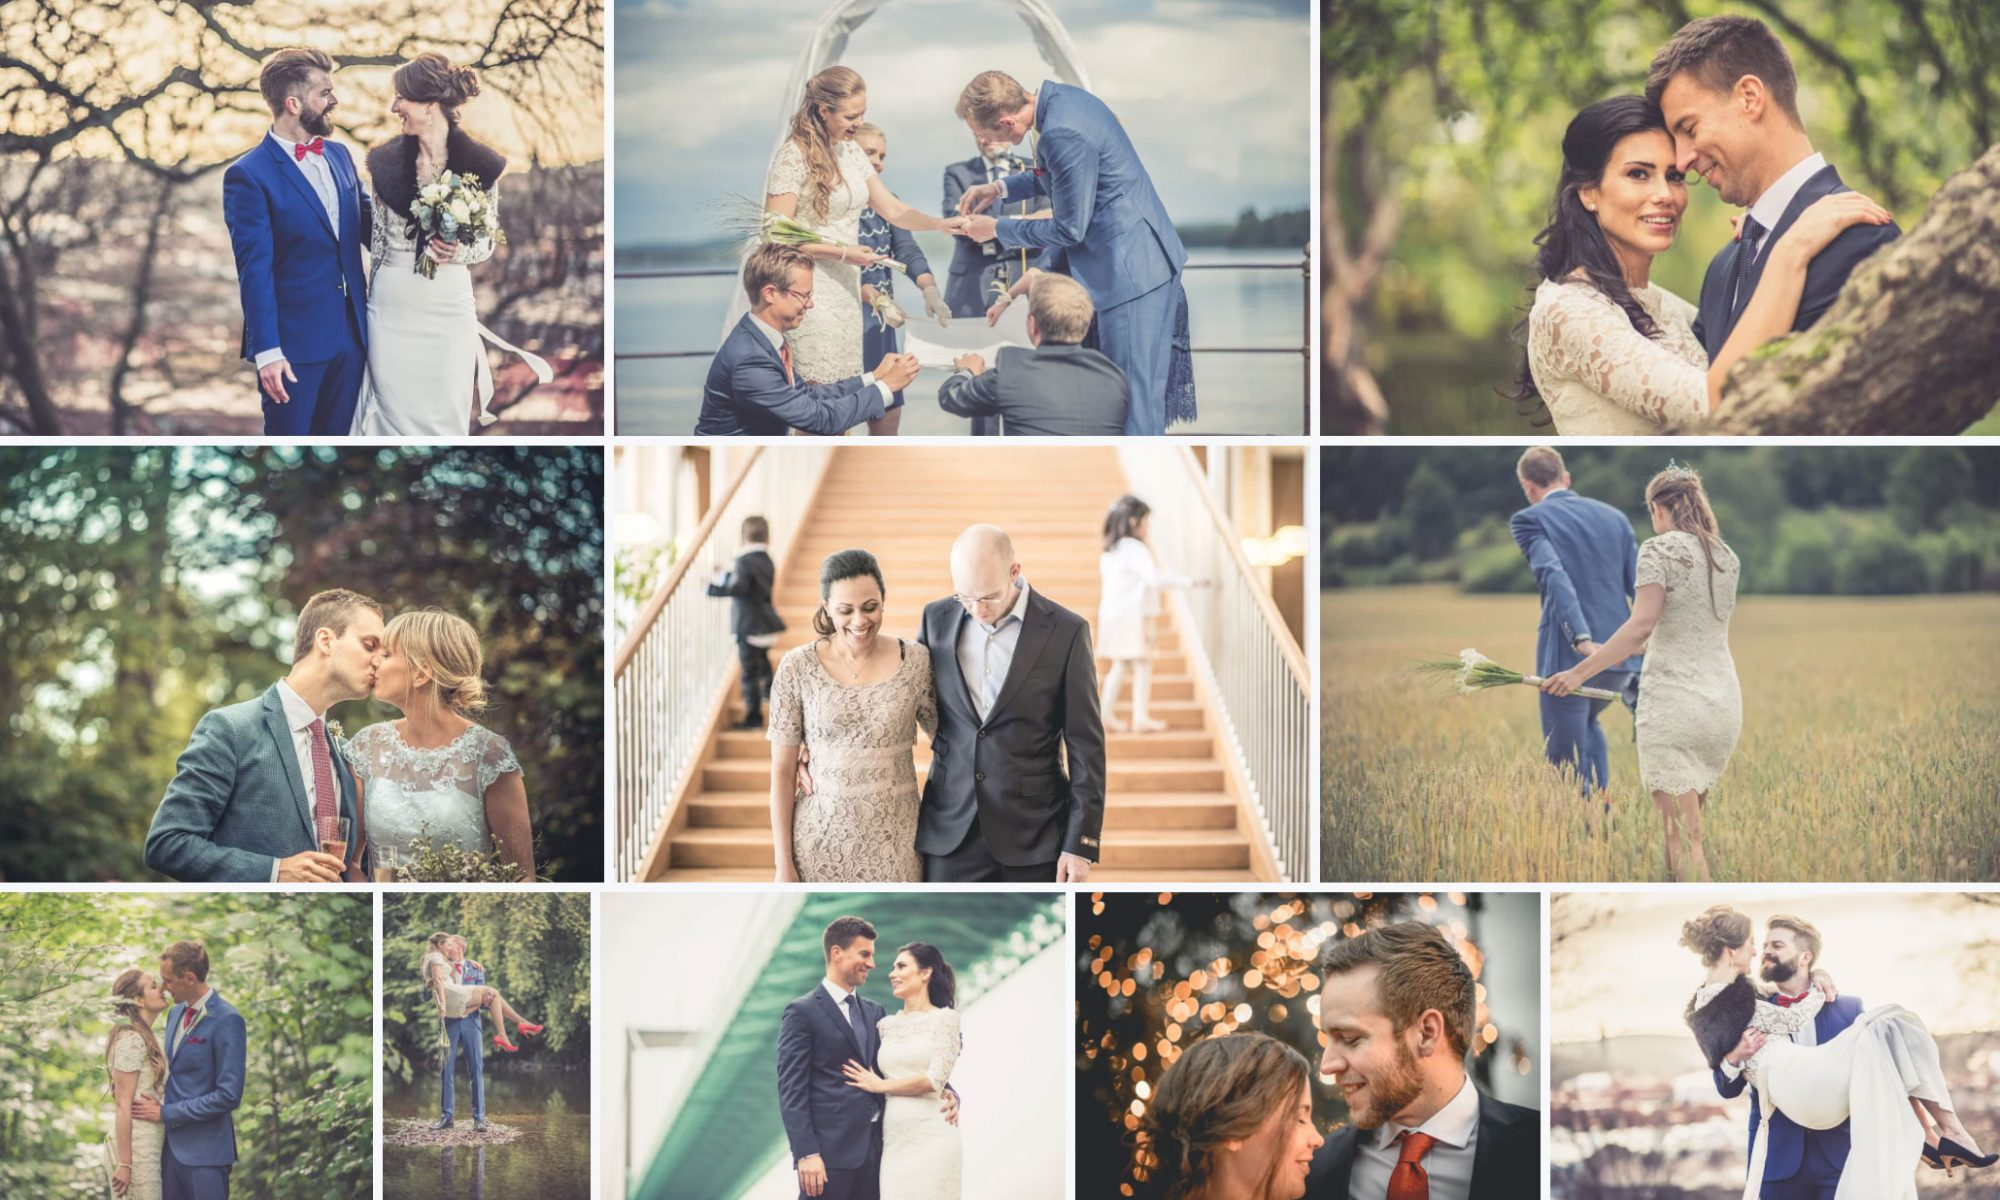 Bröllopsfotograf Axel Berglund